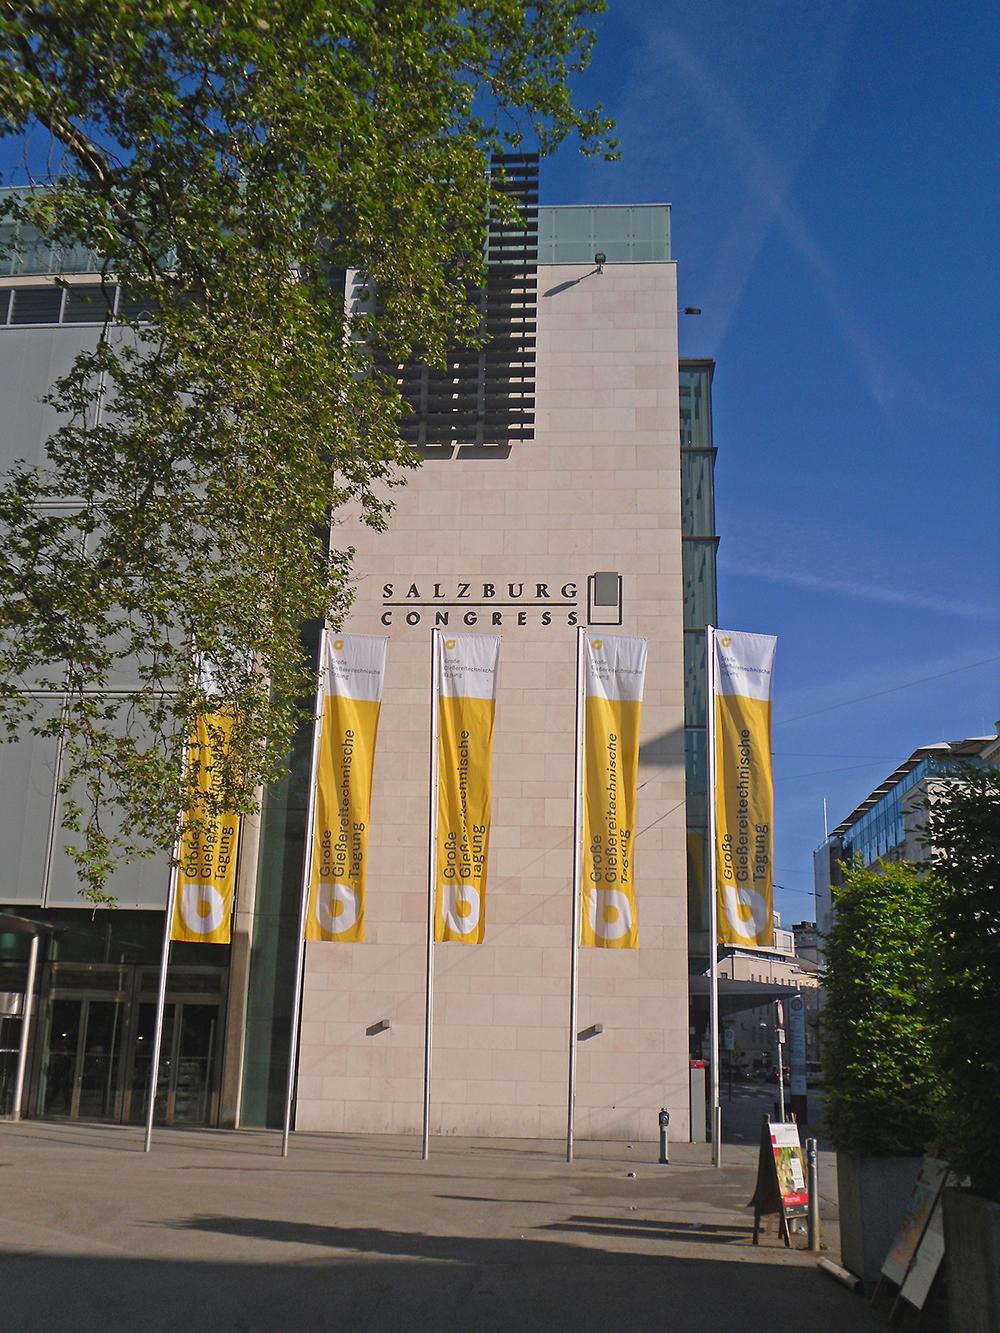 Gießereitag im Kongresszentrum Salzburg (Foto: F. Hanzig |apromace data systems GmbH)